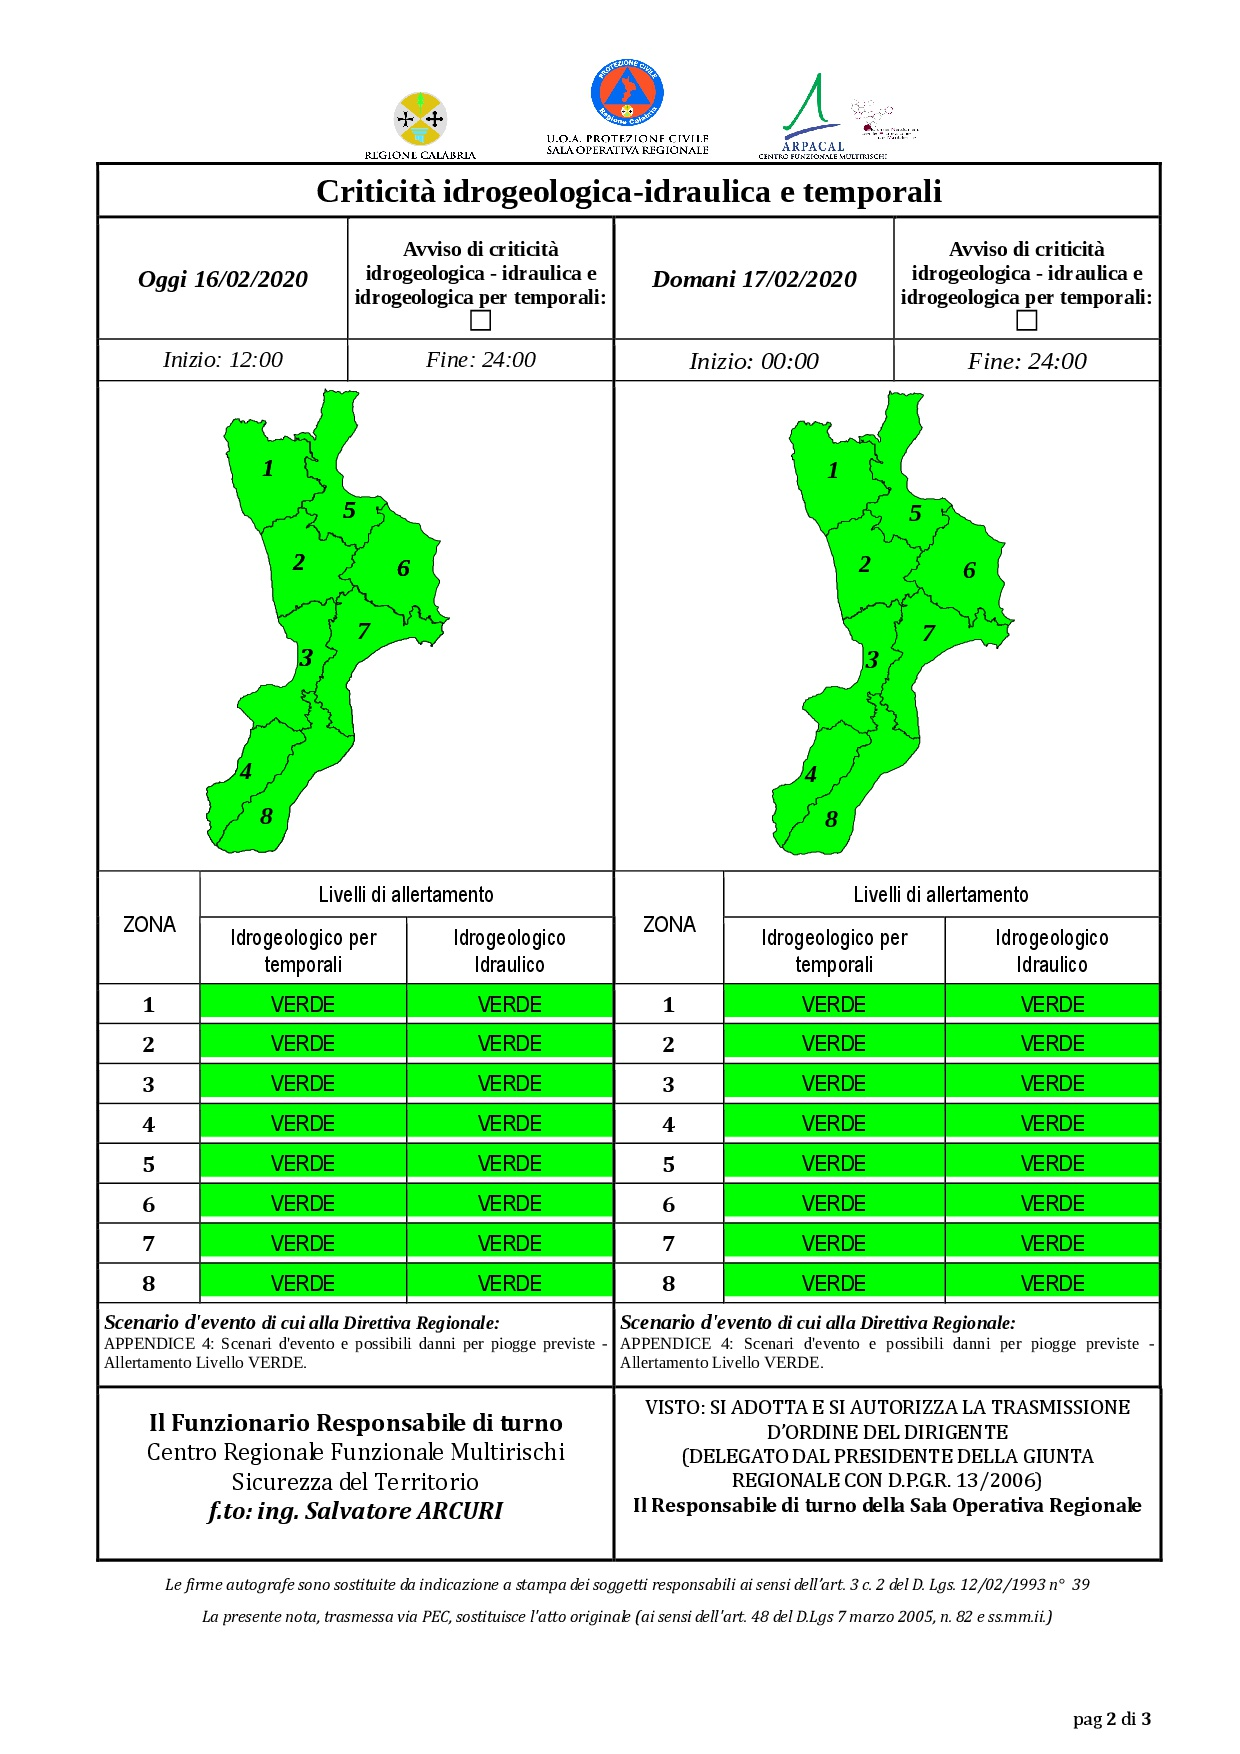 Criticità idrogeologica-idraulica e temporali in Calabria 16-02-2020